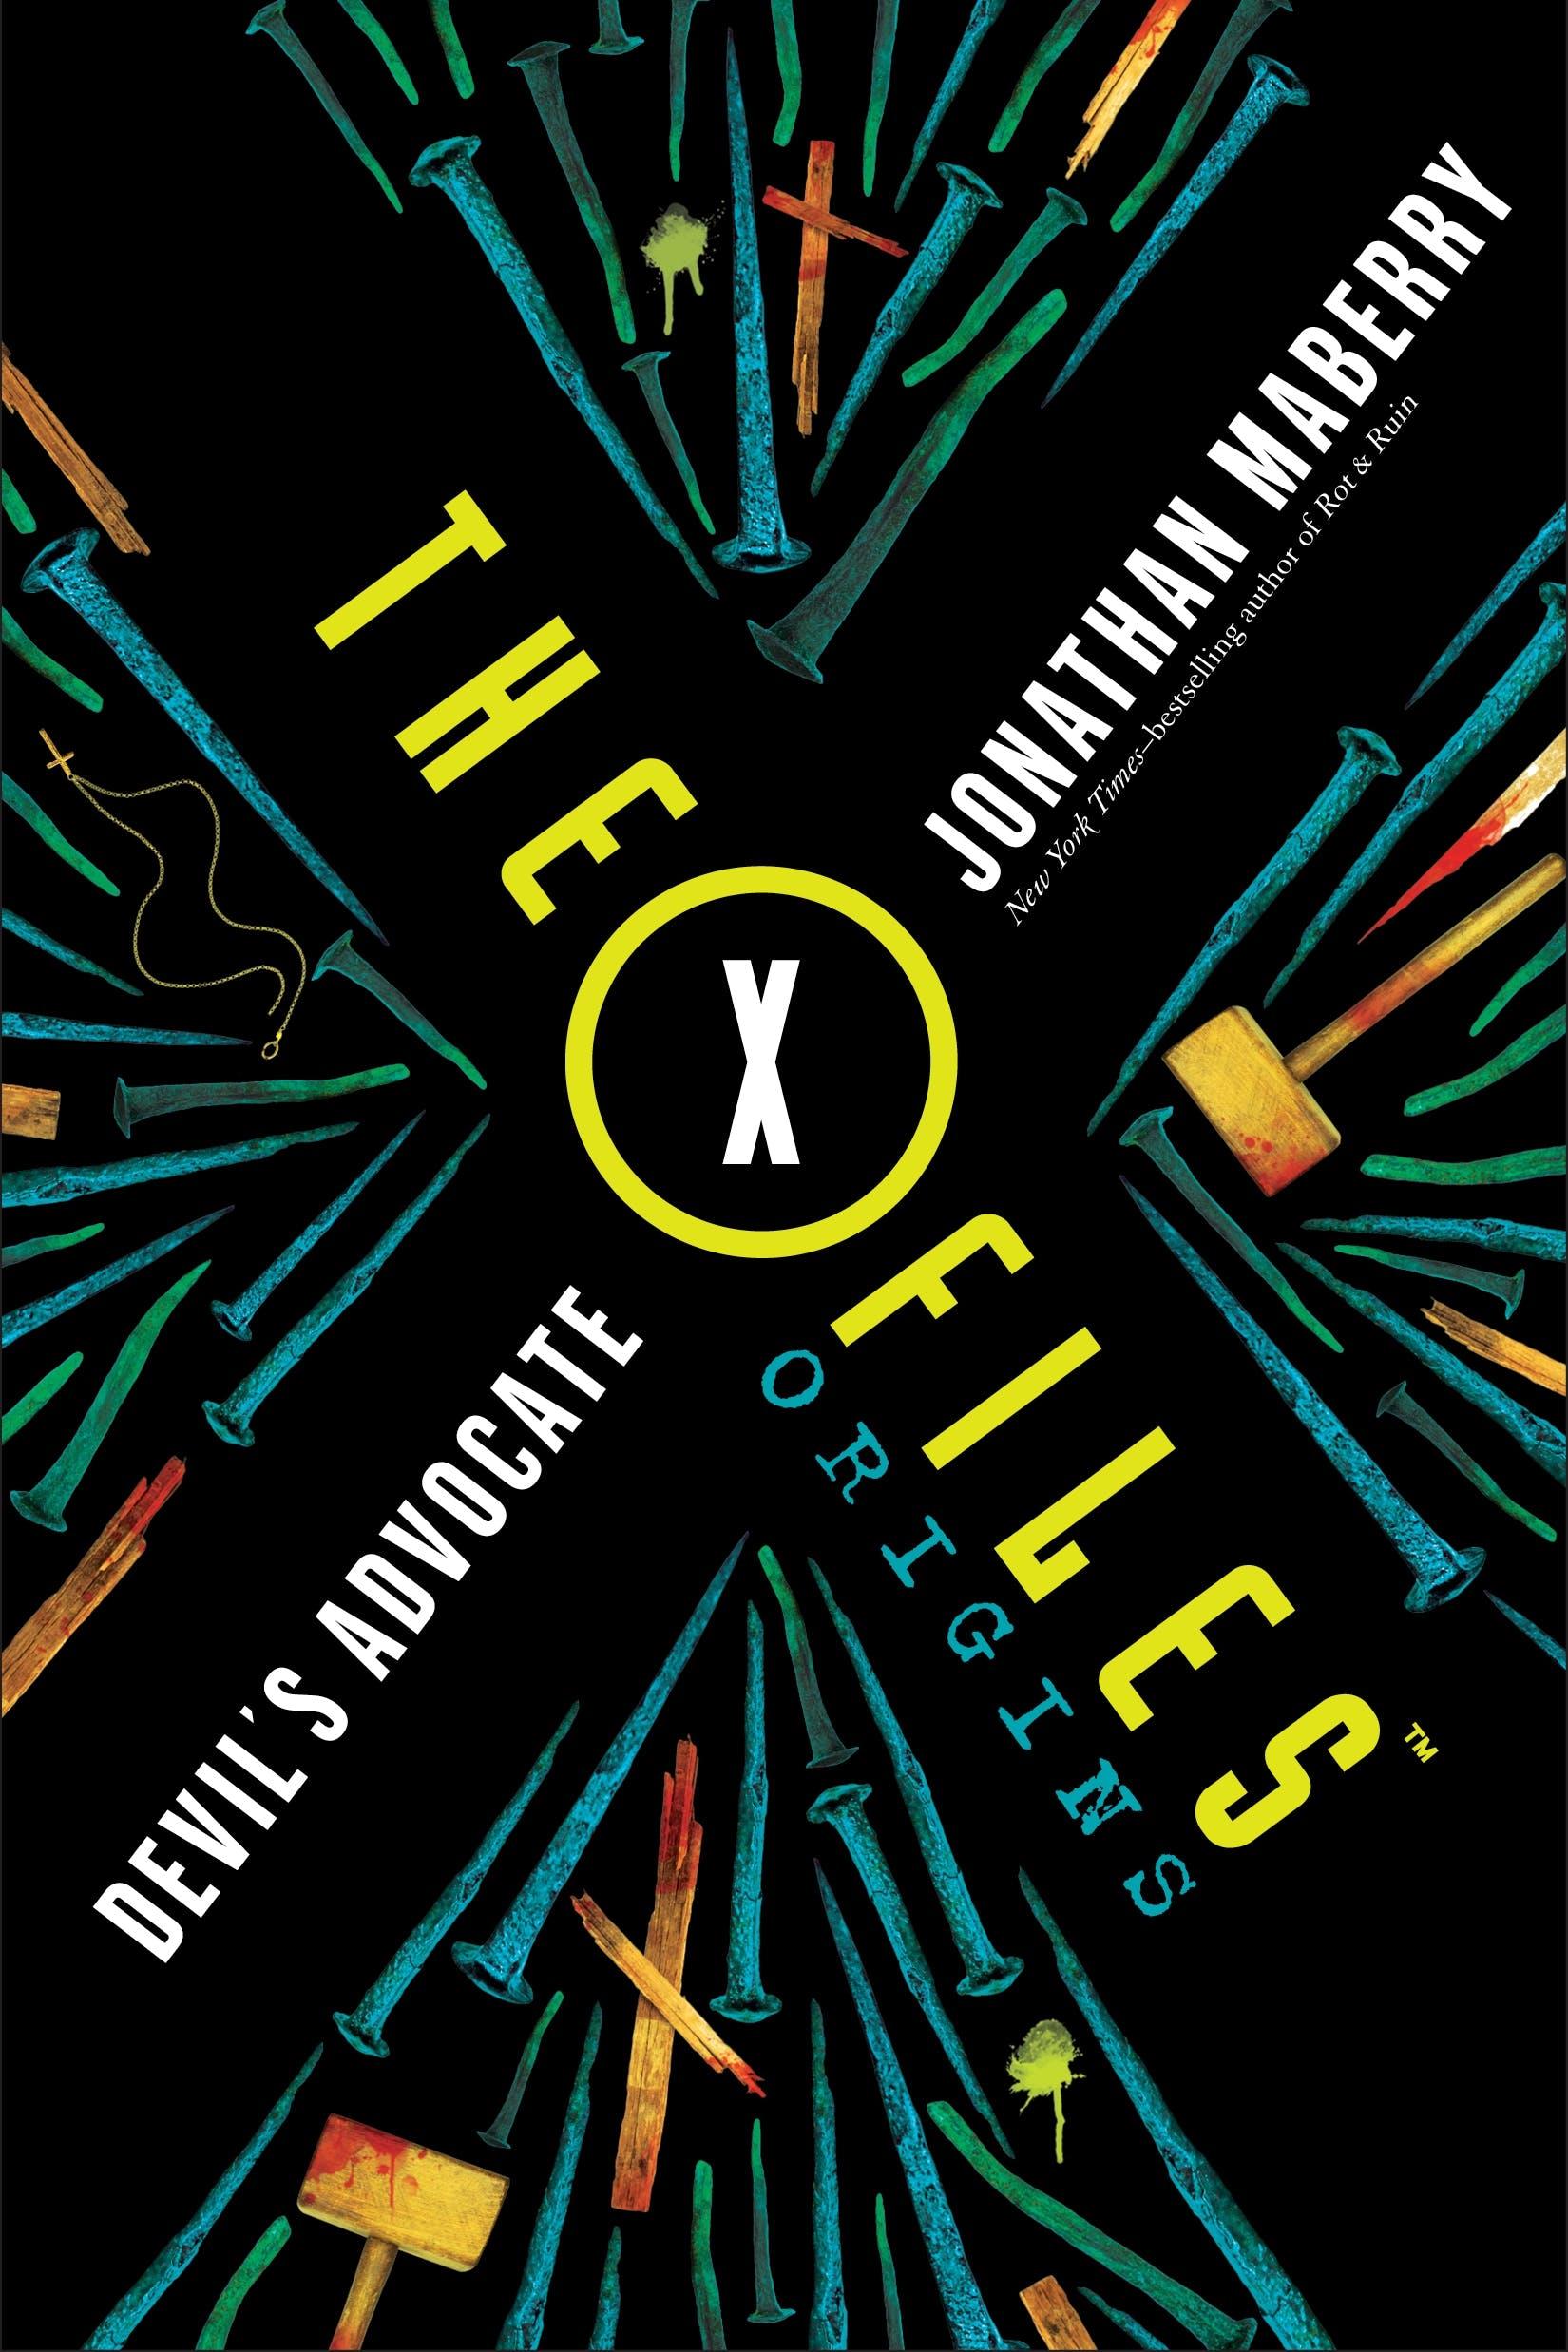 Image of The X-Files Origins: Devil's Advocate